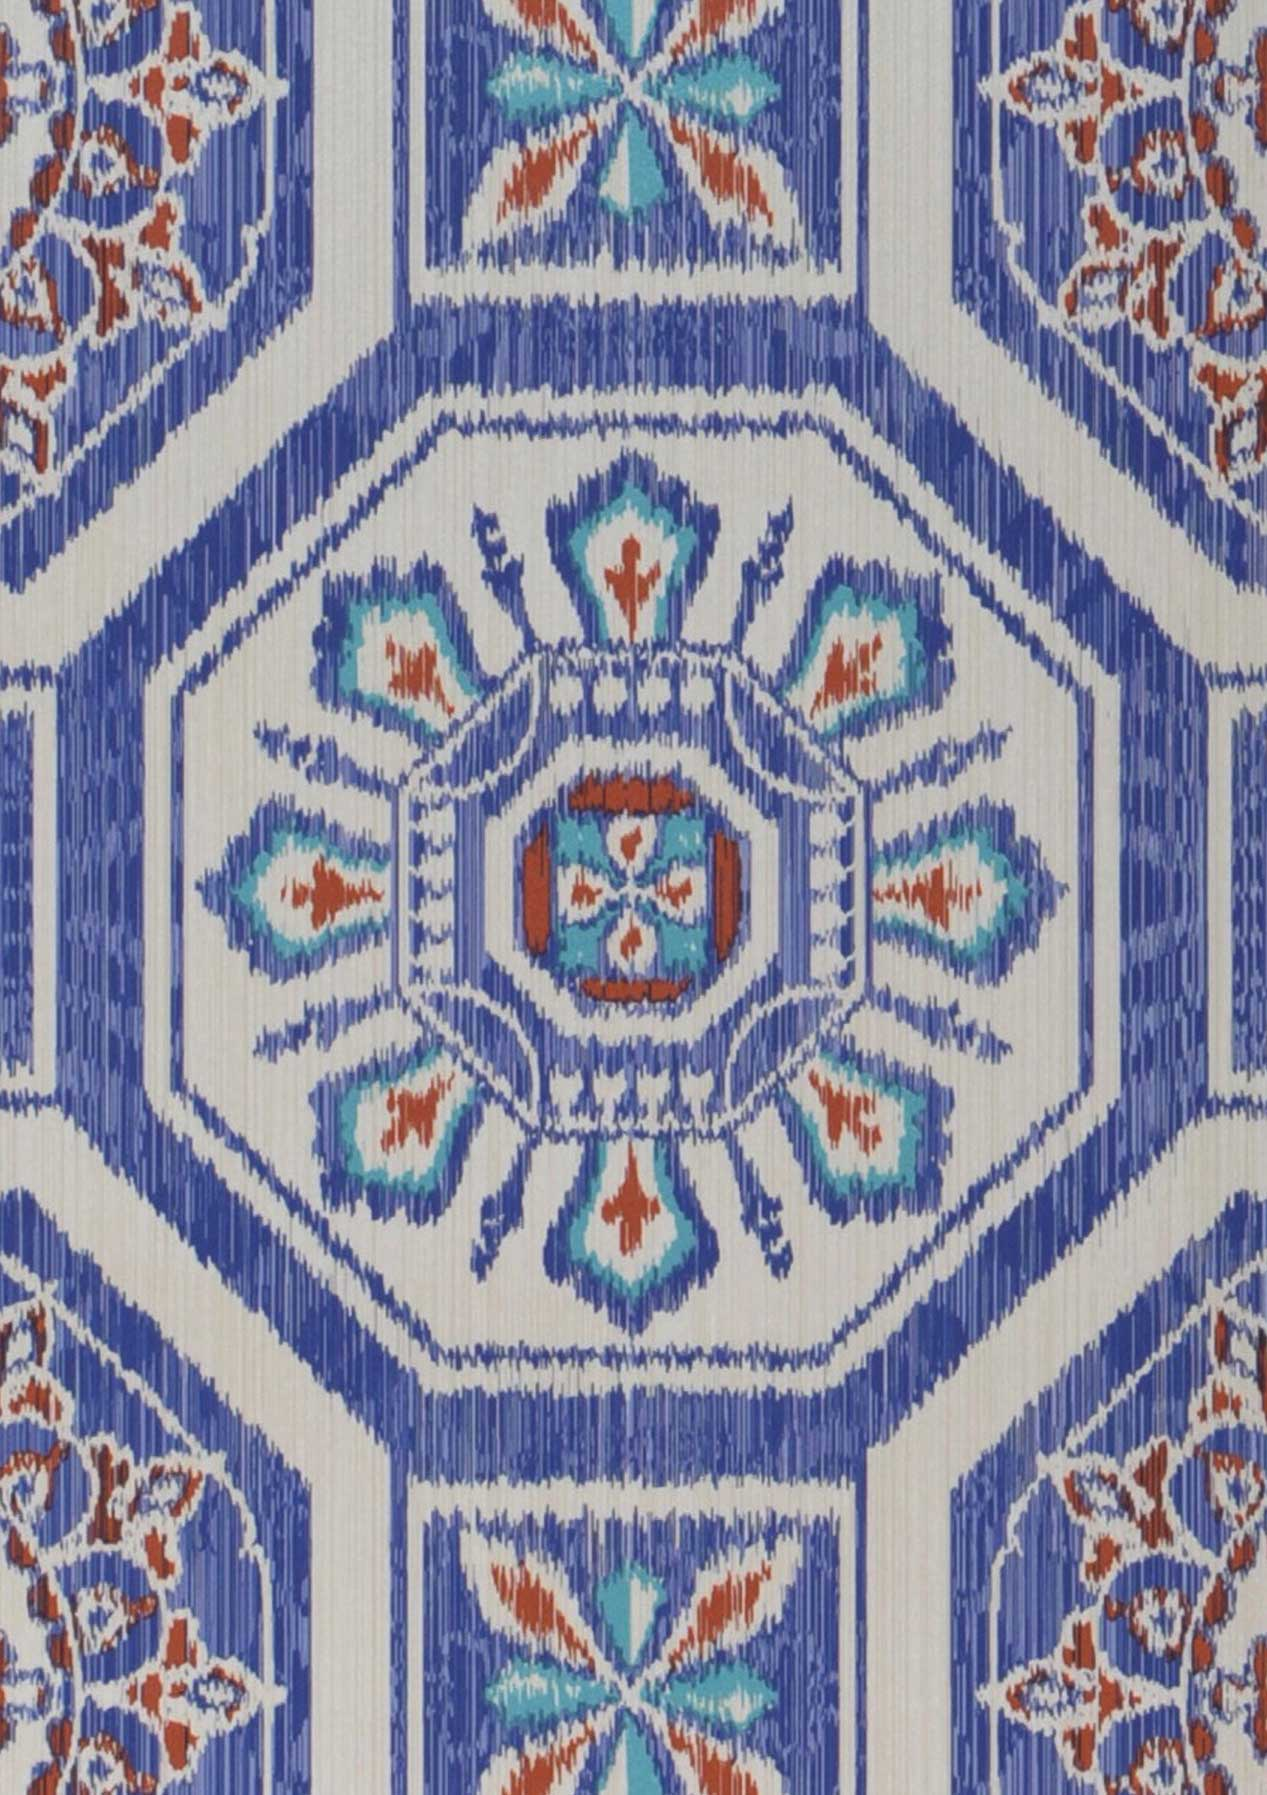 Papel pintado hesperus blanco crema rojo azul turquesa for Papel pintado azul turquesa